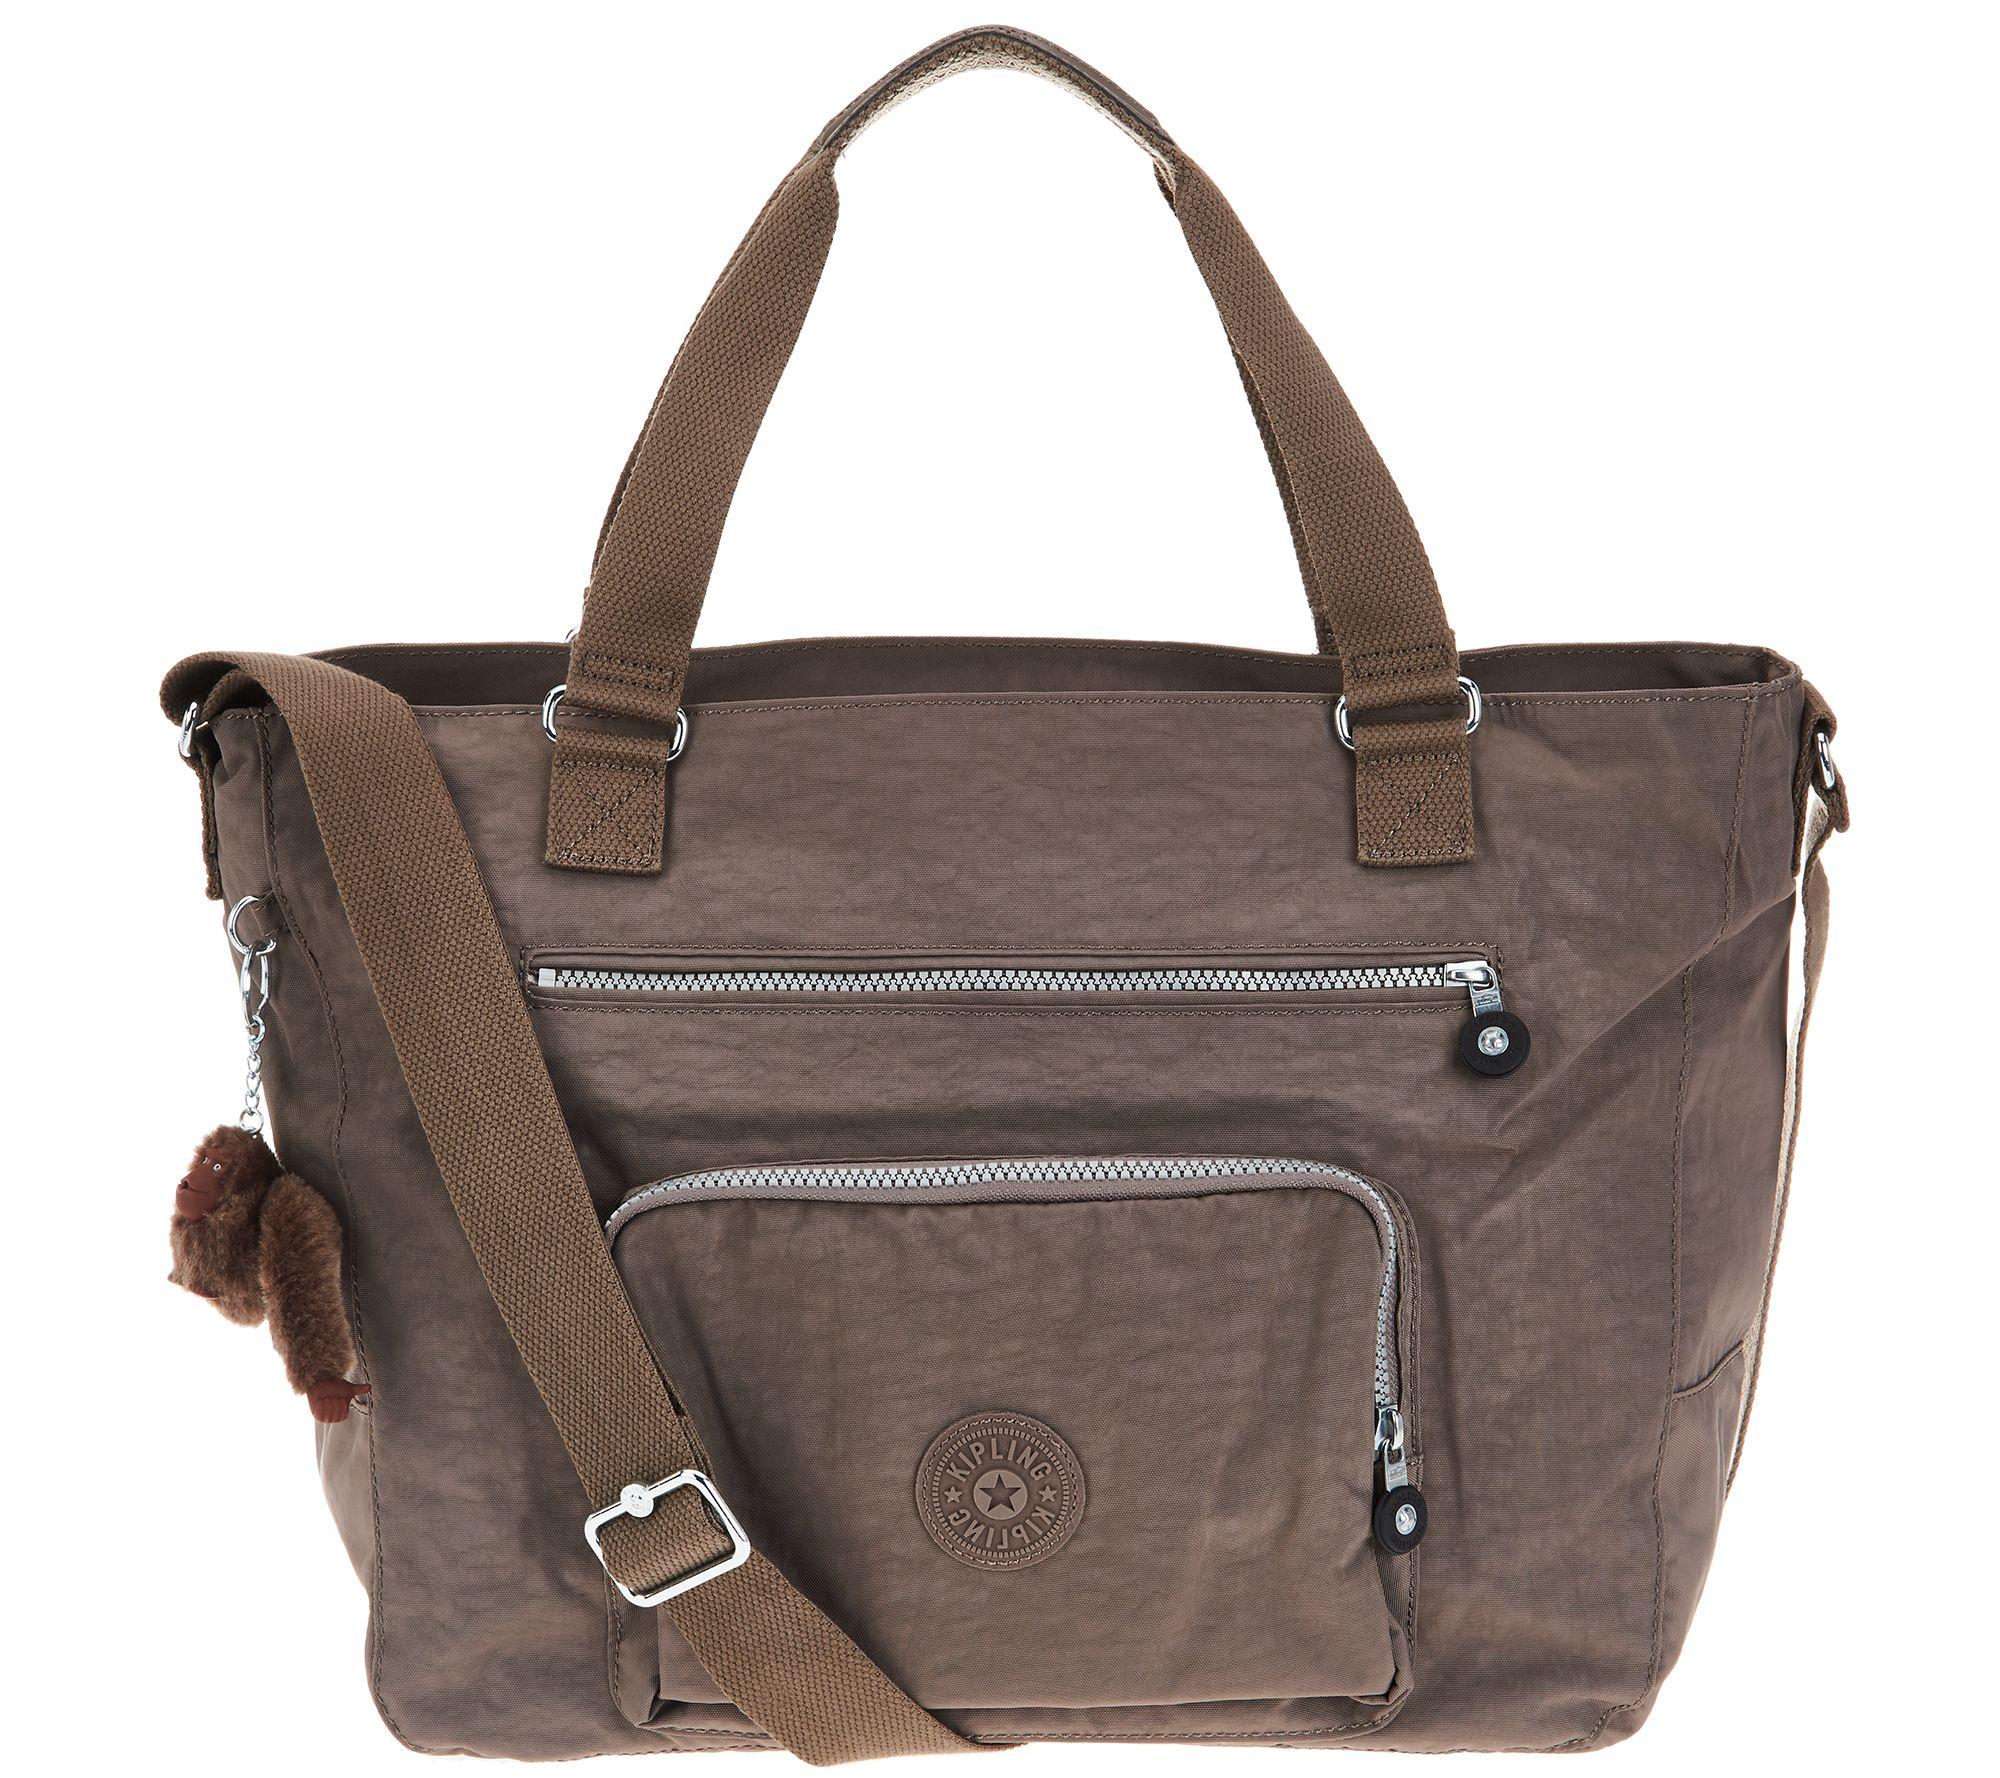 c517b419f Kipling Convertible Tote Bag - Maxwell - Page 1 — QVC.com